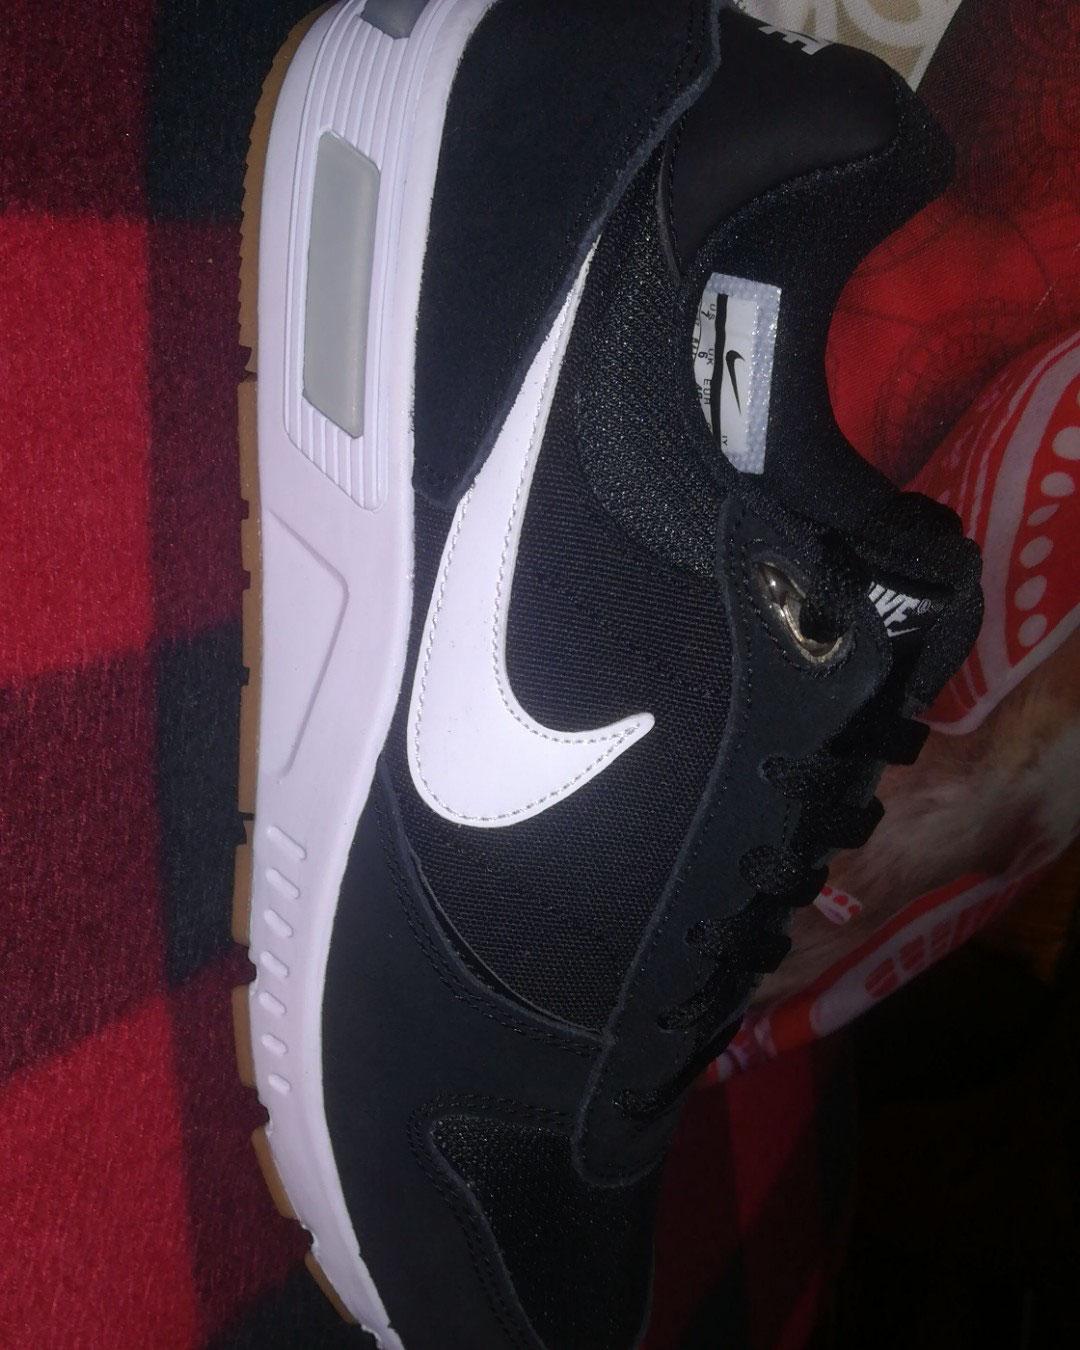 Scarpa Nike Nightgazer Uomo Nero from Nike on 21 Buttons